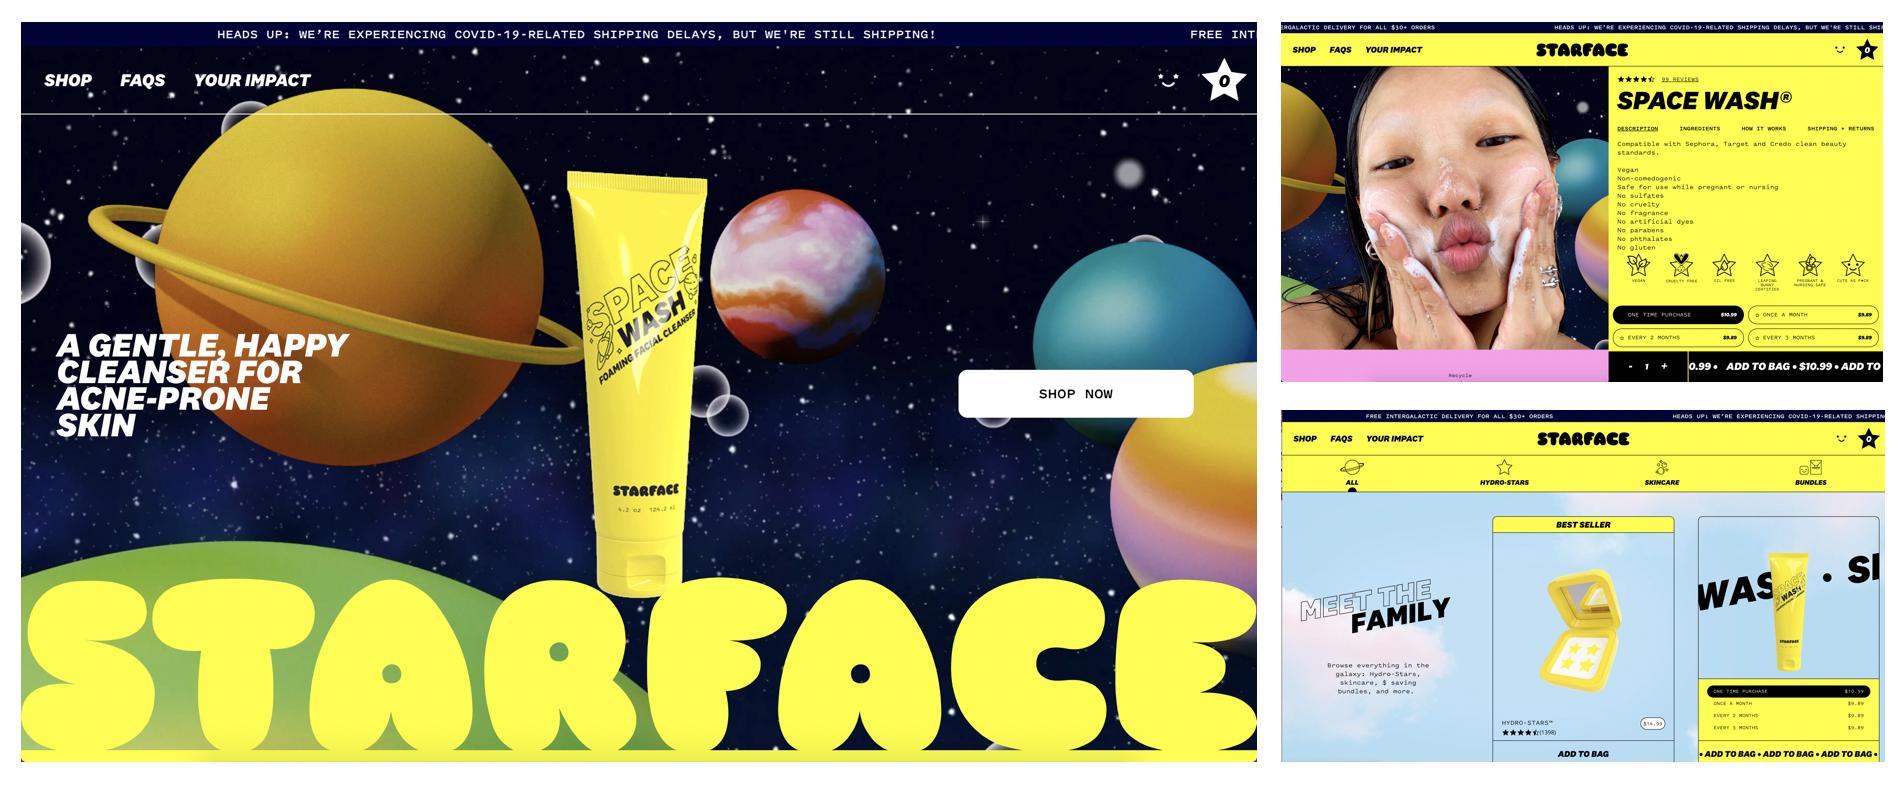 Starface ecommerce